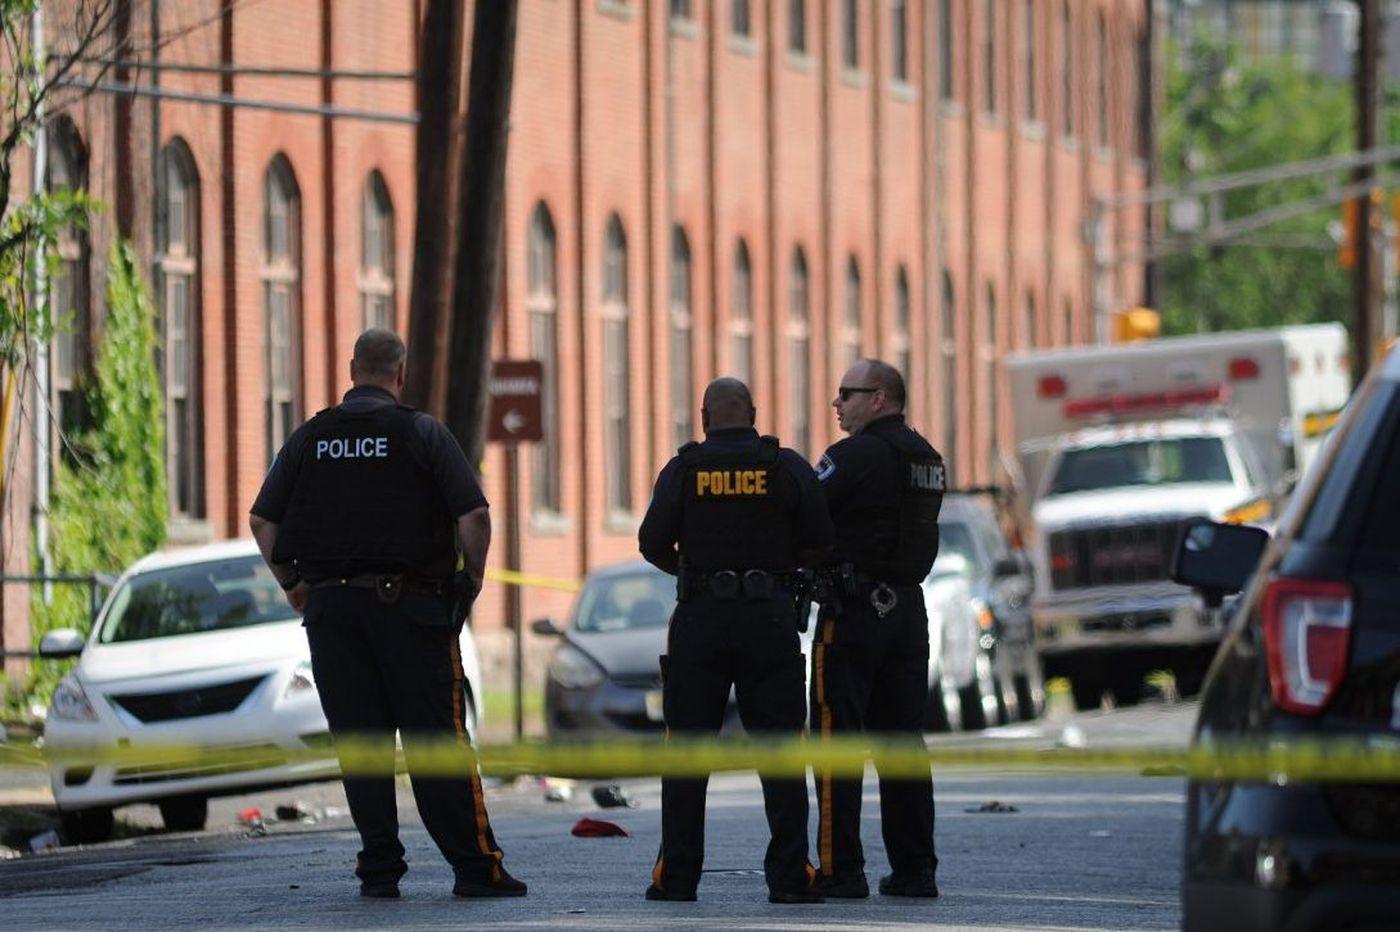 Gunmen ID'd in Trenton arts festival shooting that left 1 dead, 22 injured